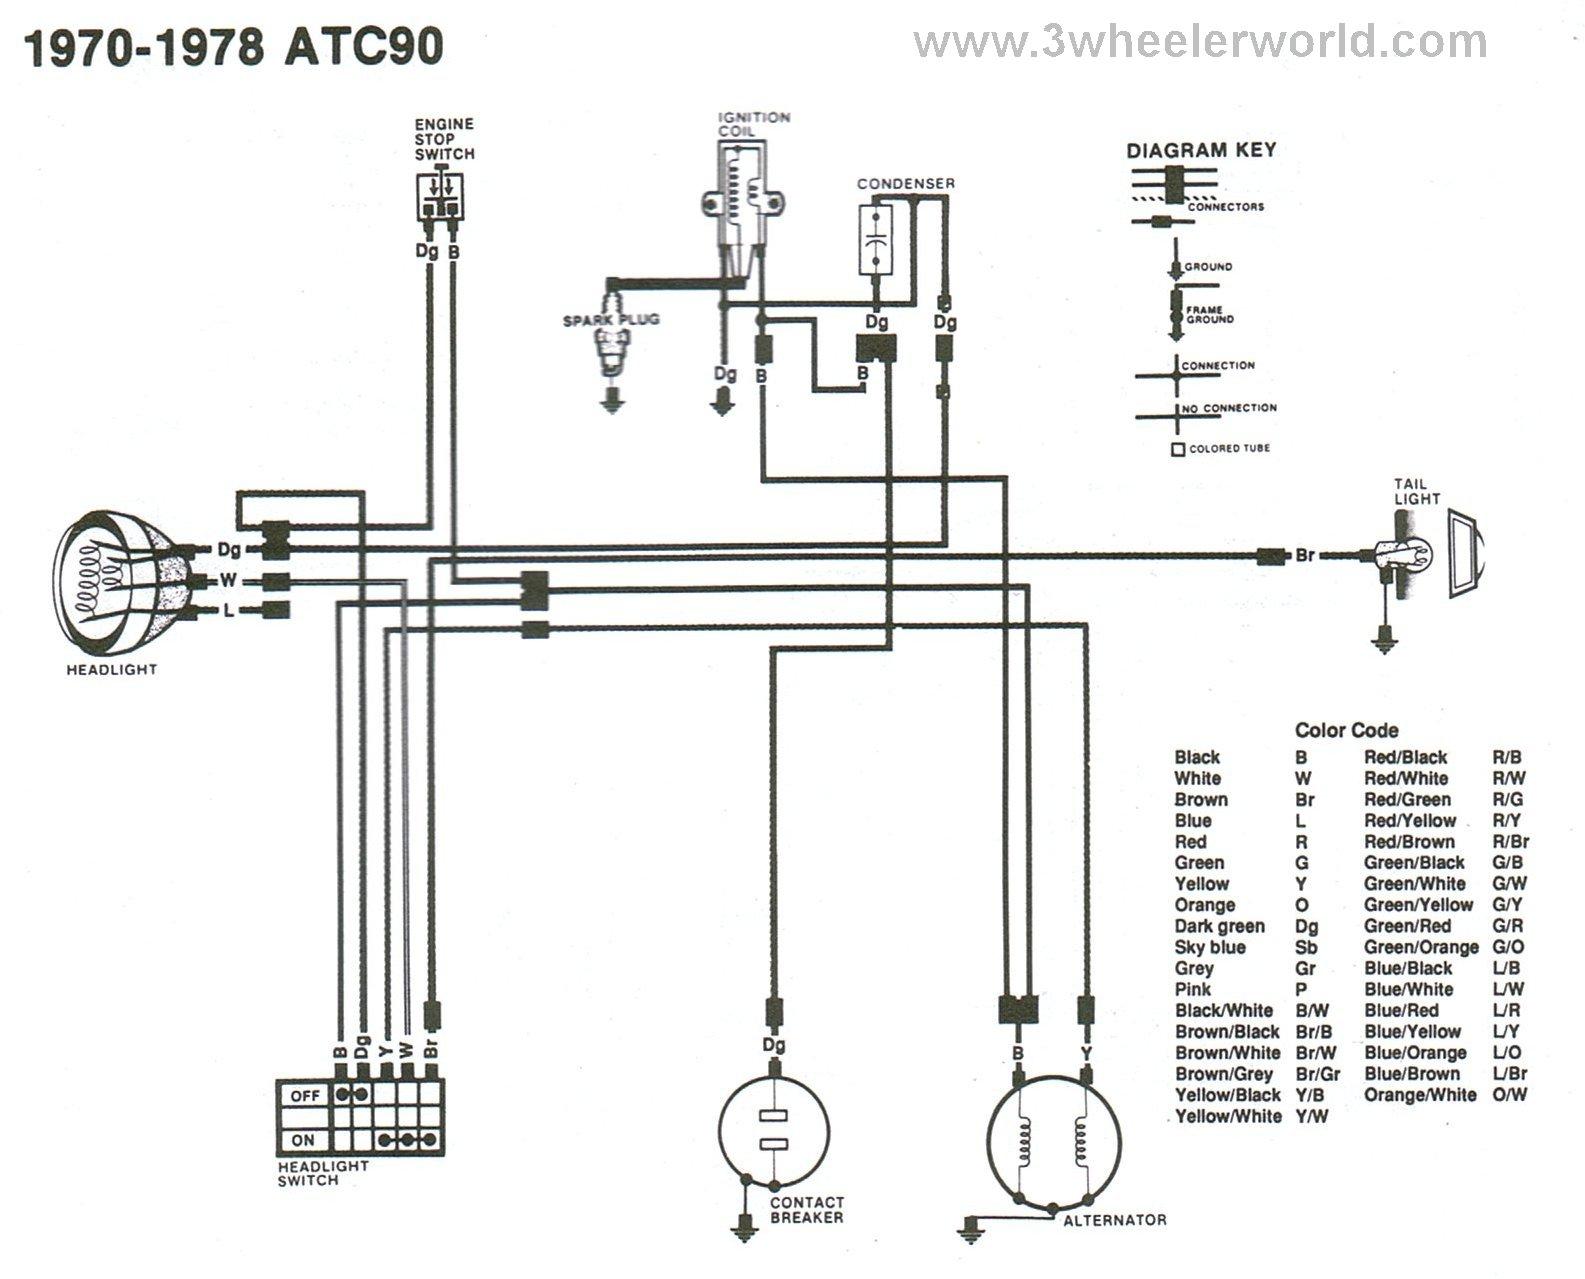 honda ct200 wiring diagram honda image wiring diagram honda 200x wiring diagram honda discover your wiring diagram on honda ct200 wiring diagram